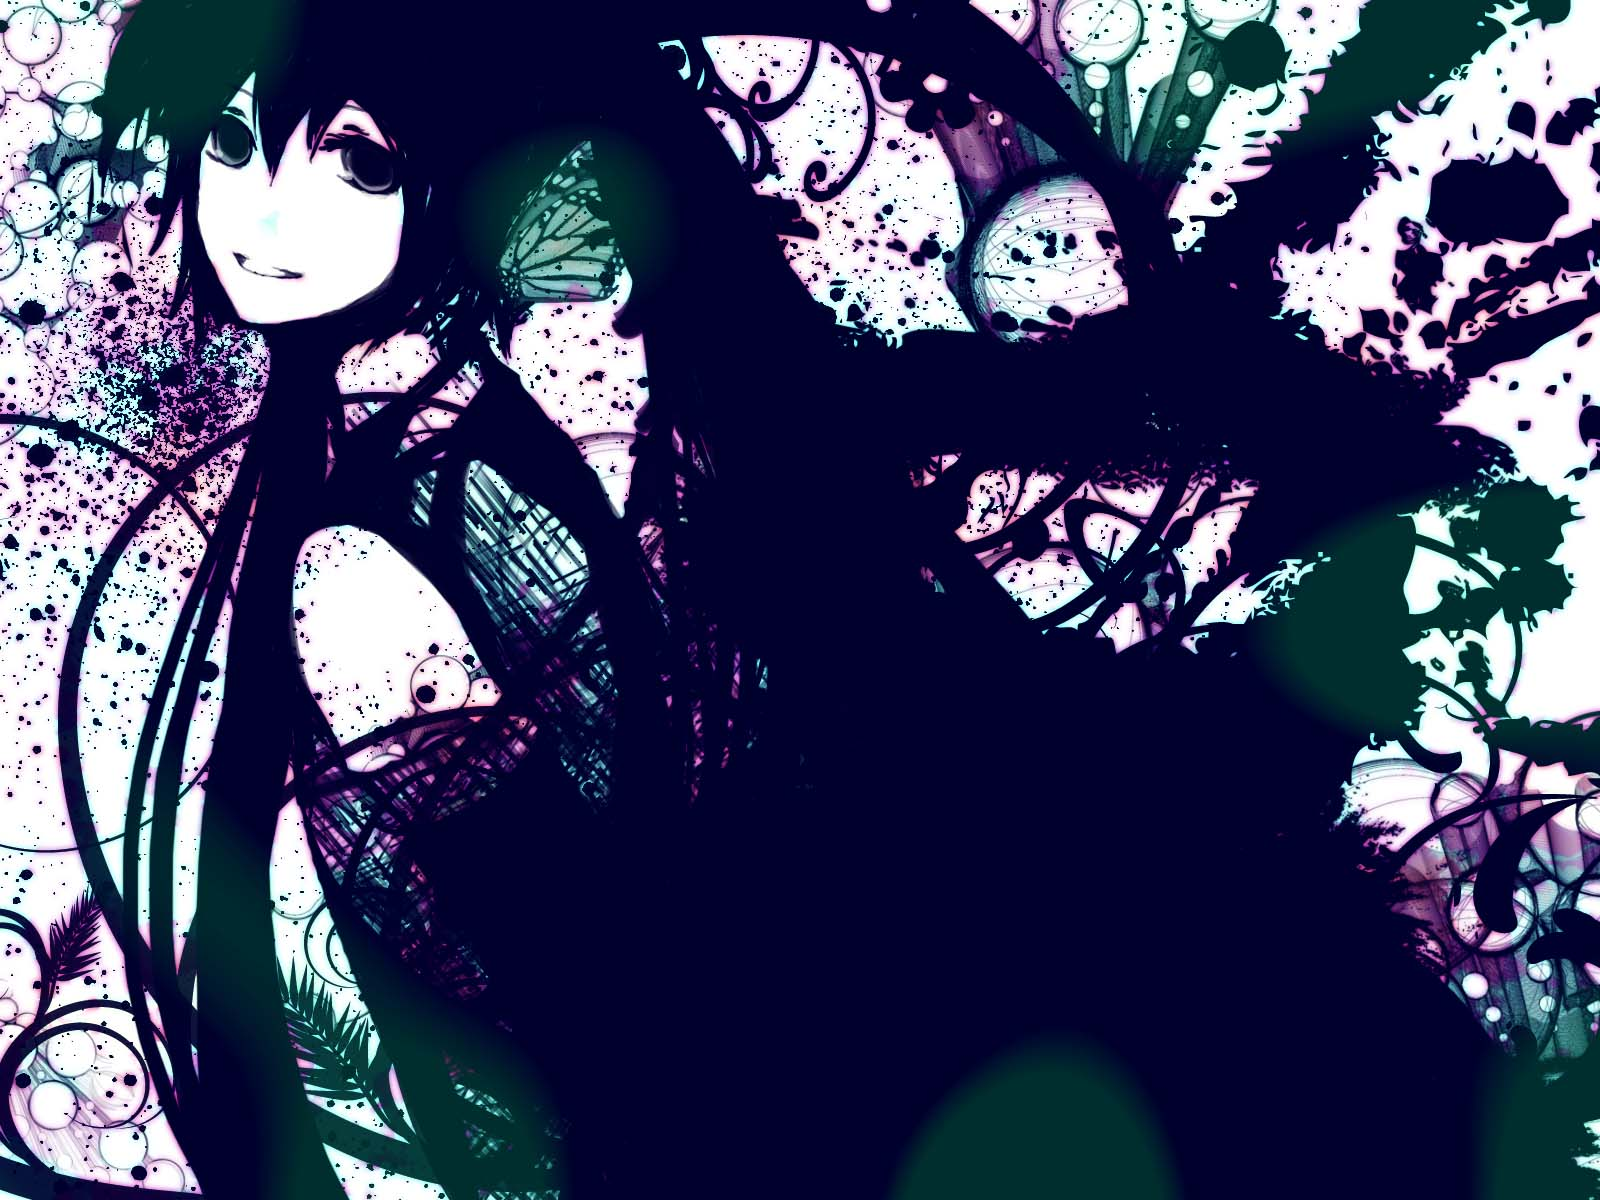 Hatsune miku hope